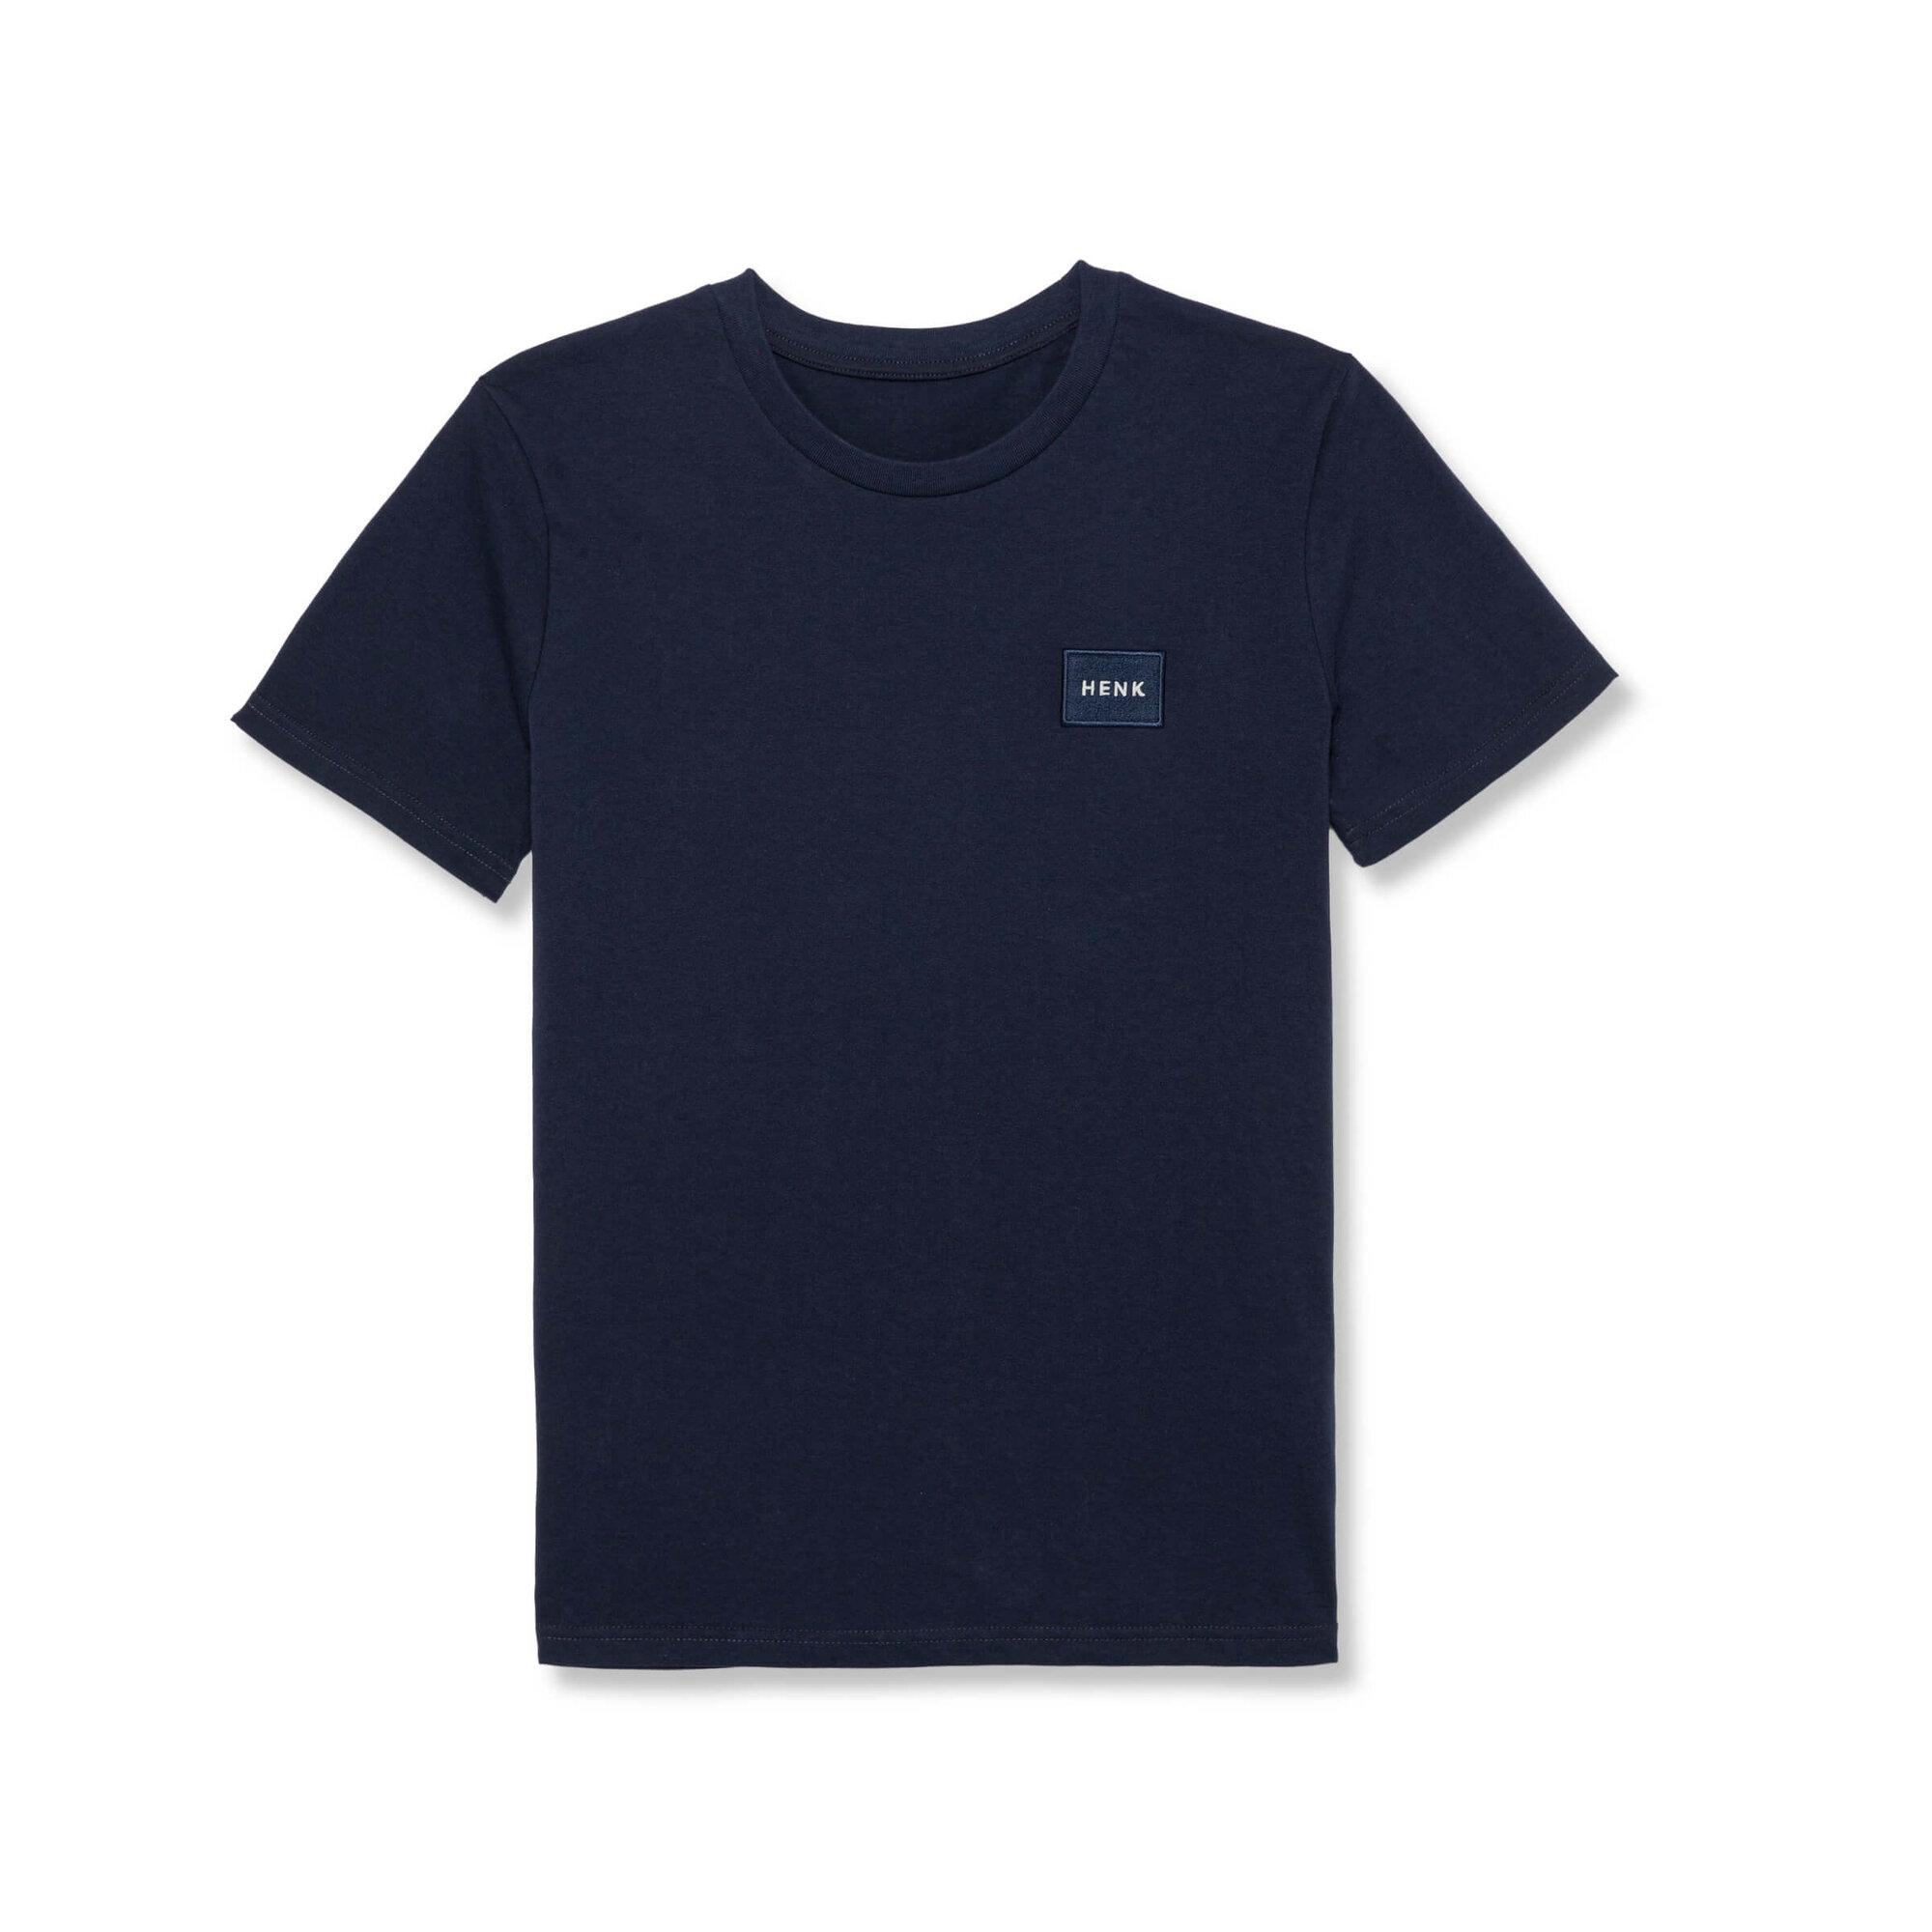 T-shirt | Navy | Studio HENK | Listing_image